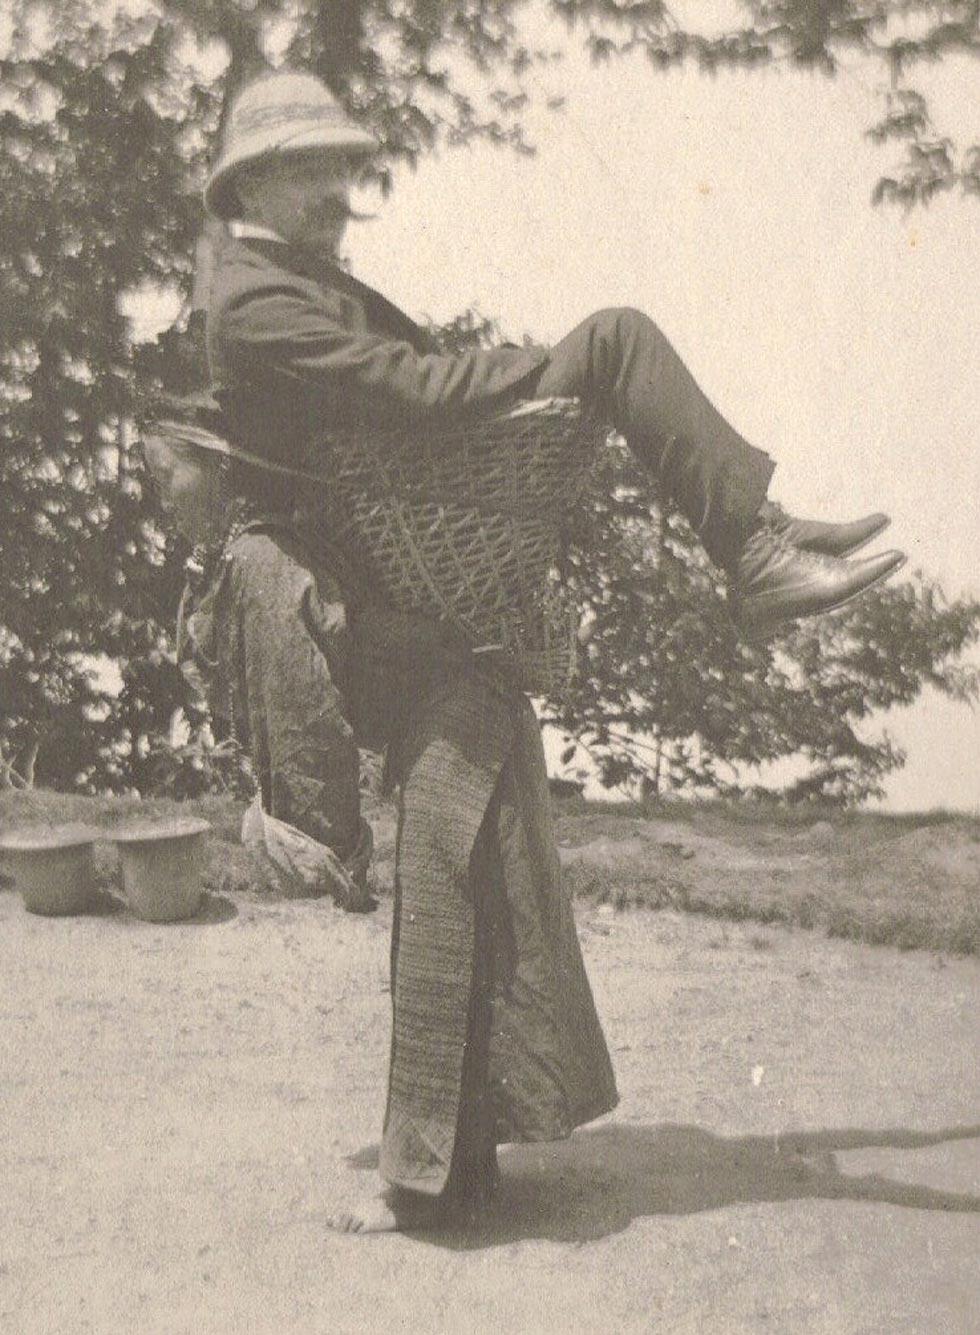 Taxi en la India (1903)